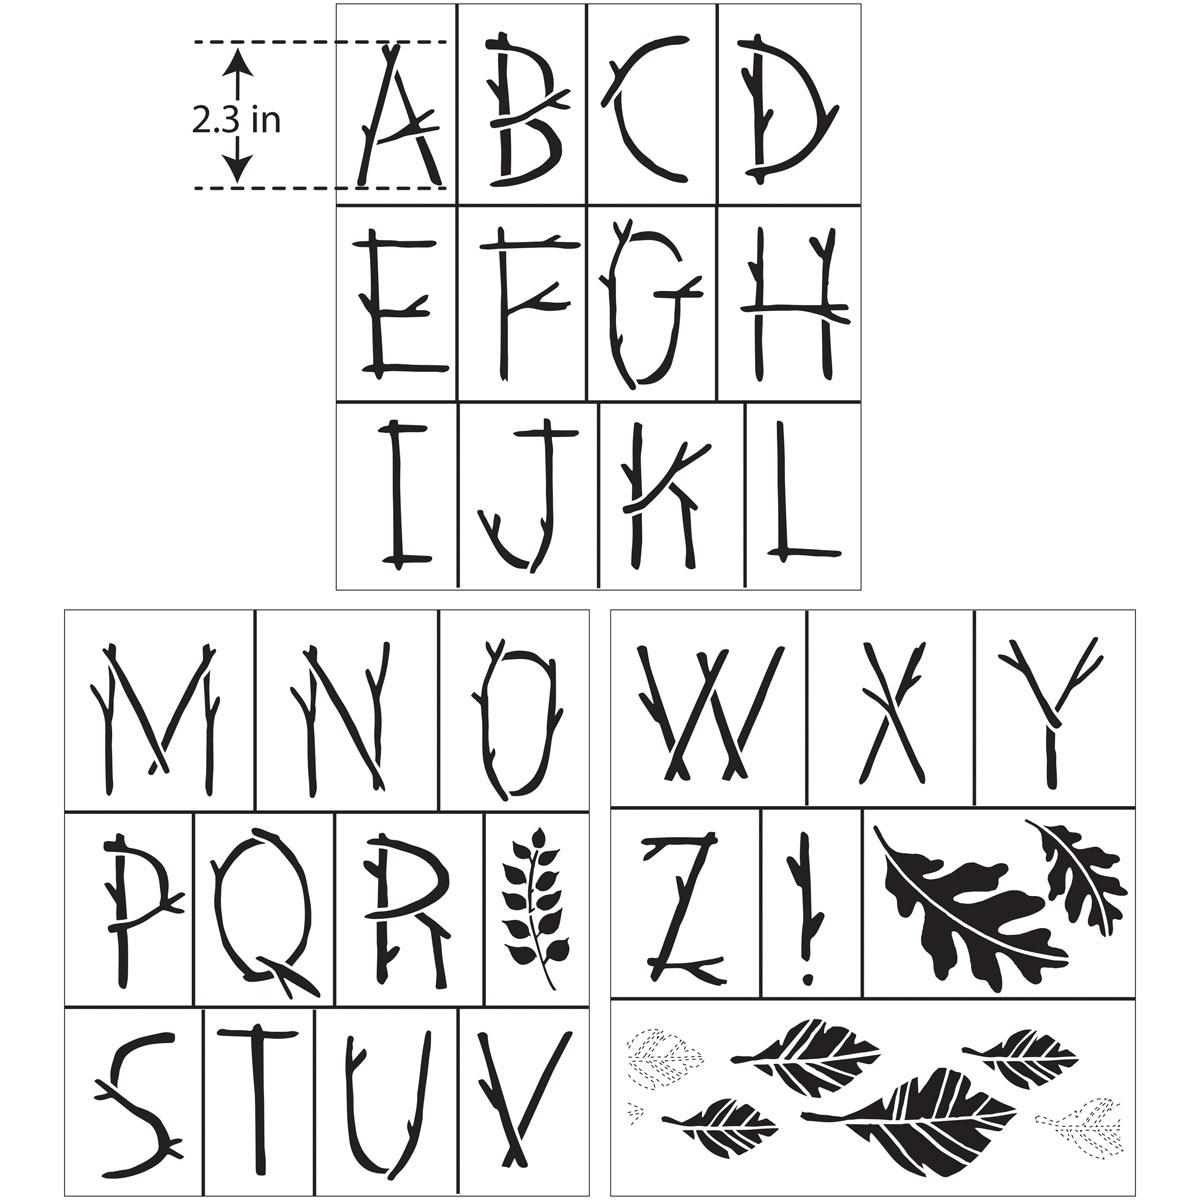 Hallmark Handcrafted Adhesive Stencils - Nature Font, 8-1/2